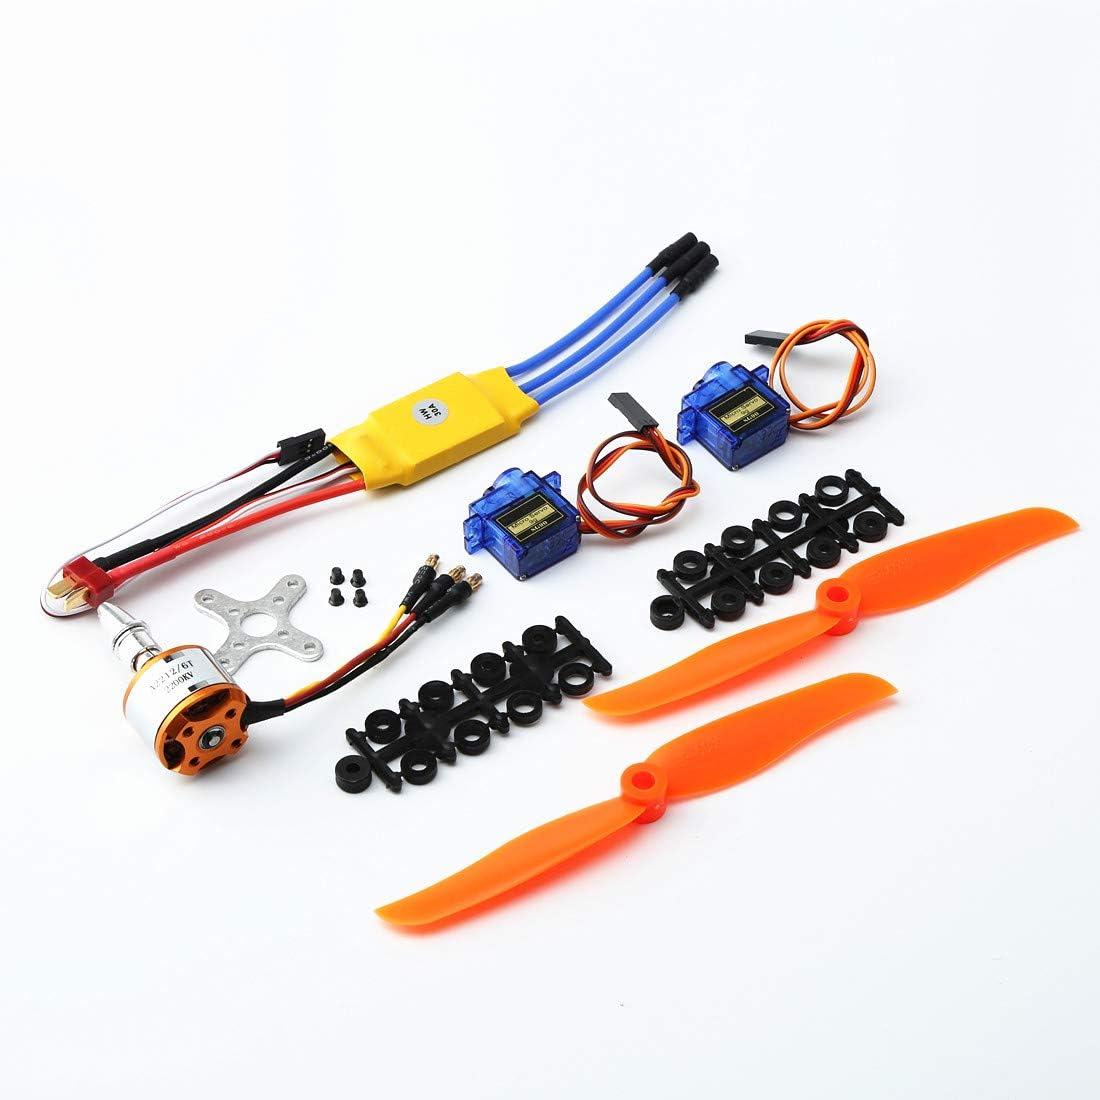 Brushless Motor 40A ESC Mikroservo Zubehör für RC-Flugzeuge